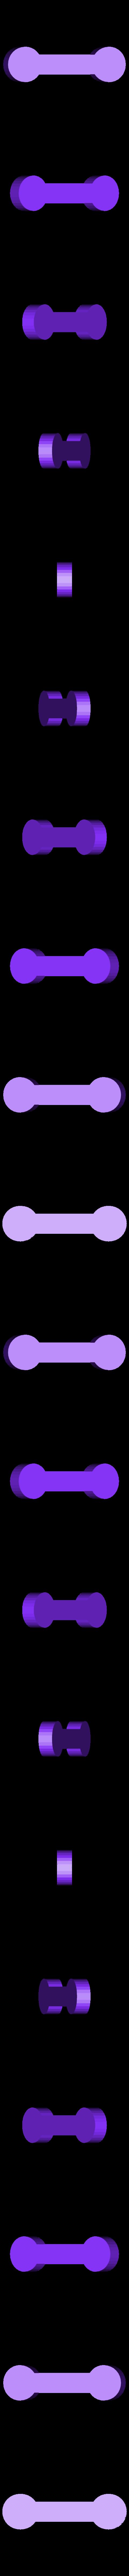 ClickLock_U_Lock.stl Télécharger fichier STL gratuit Système de construction ClickLock • Modèle à imprimer en 3D, daandruff